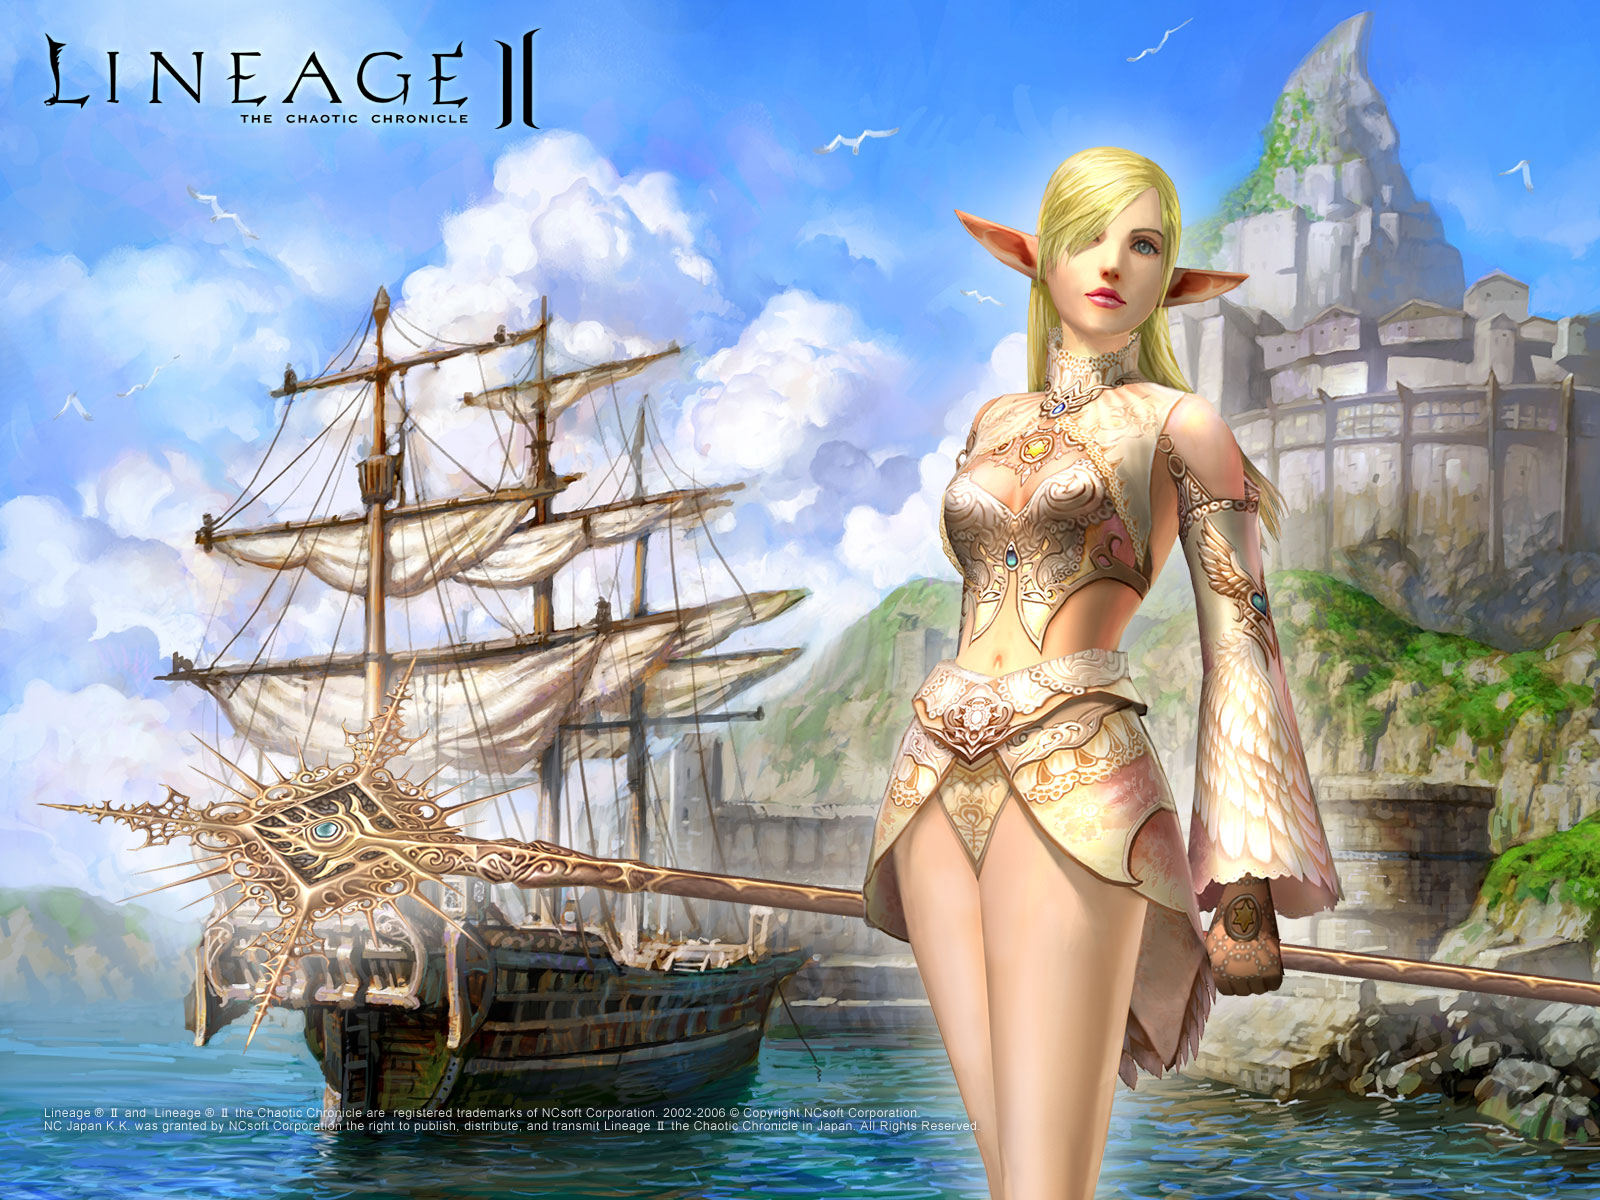 lineage 2 чит сервер: